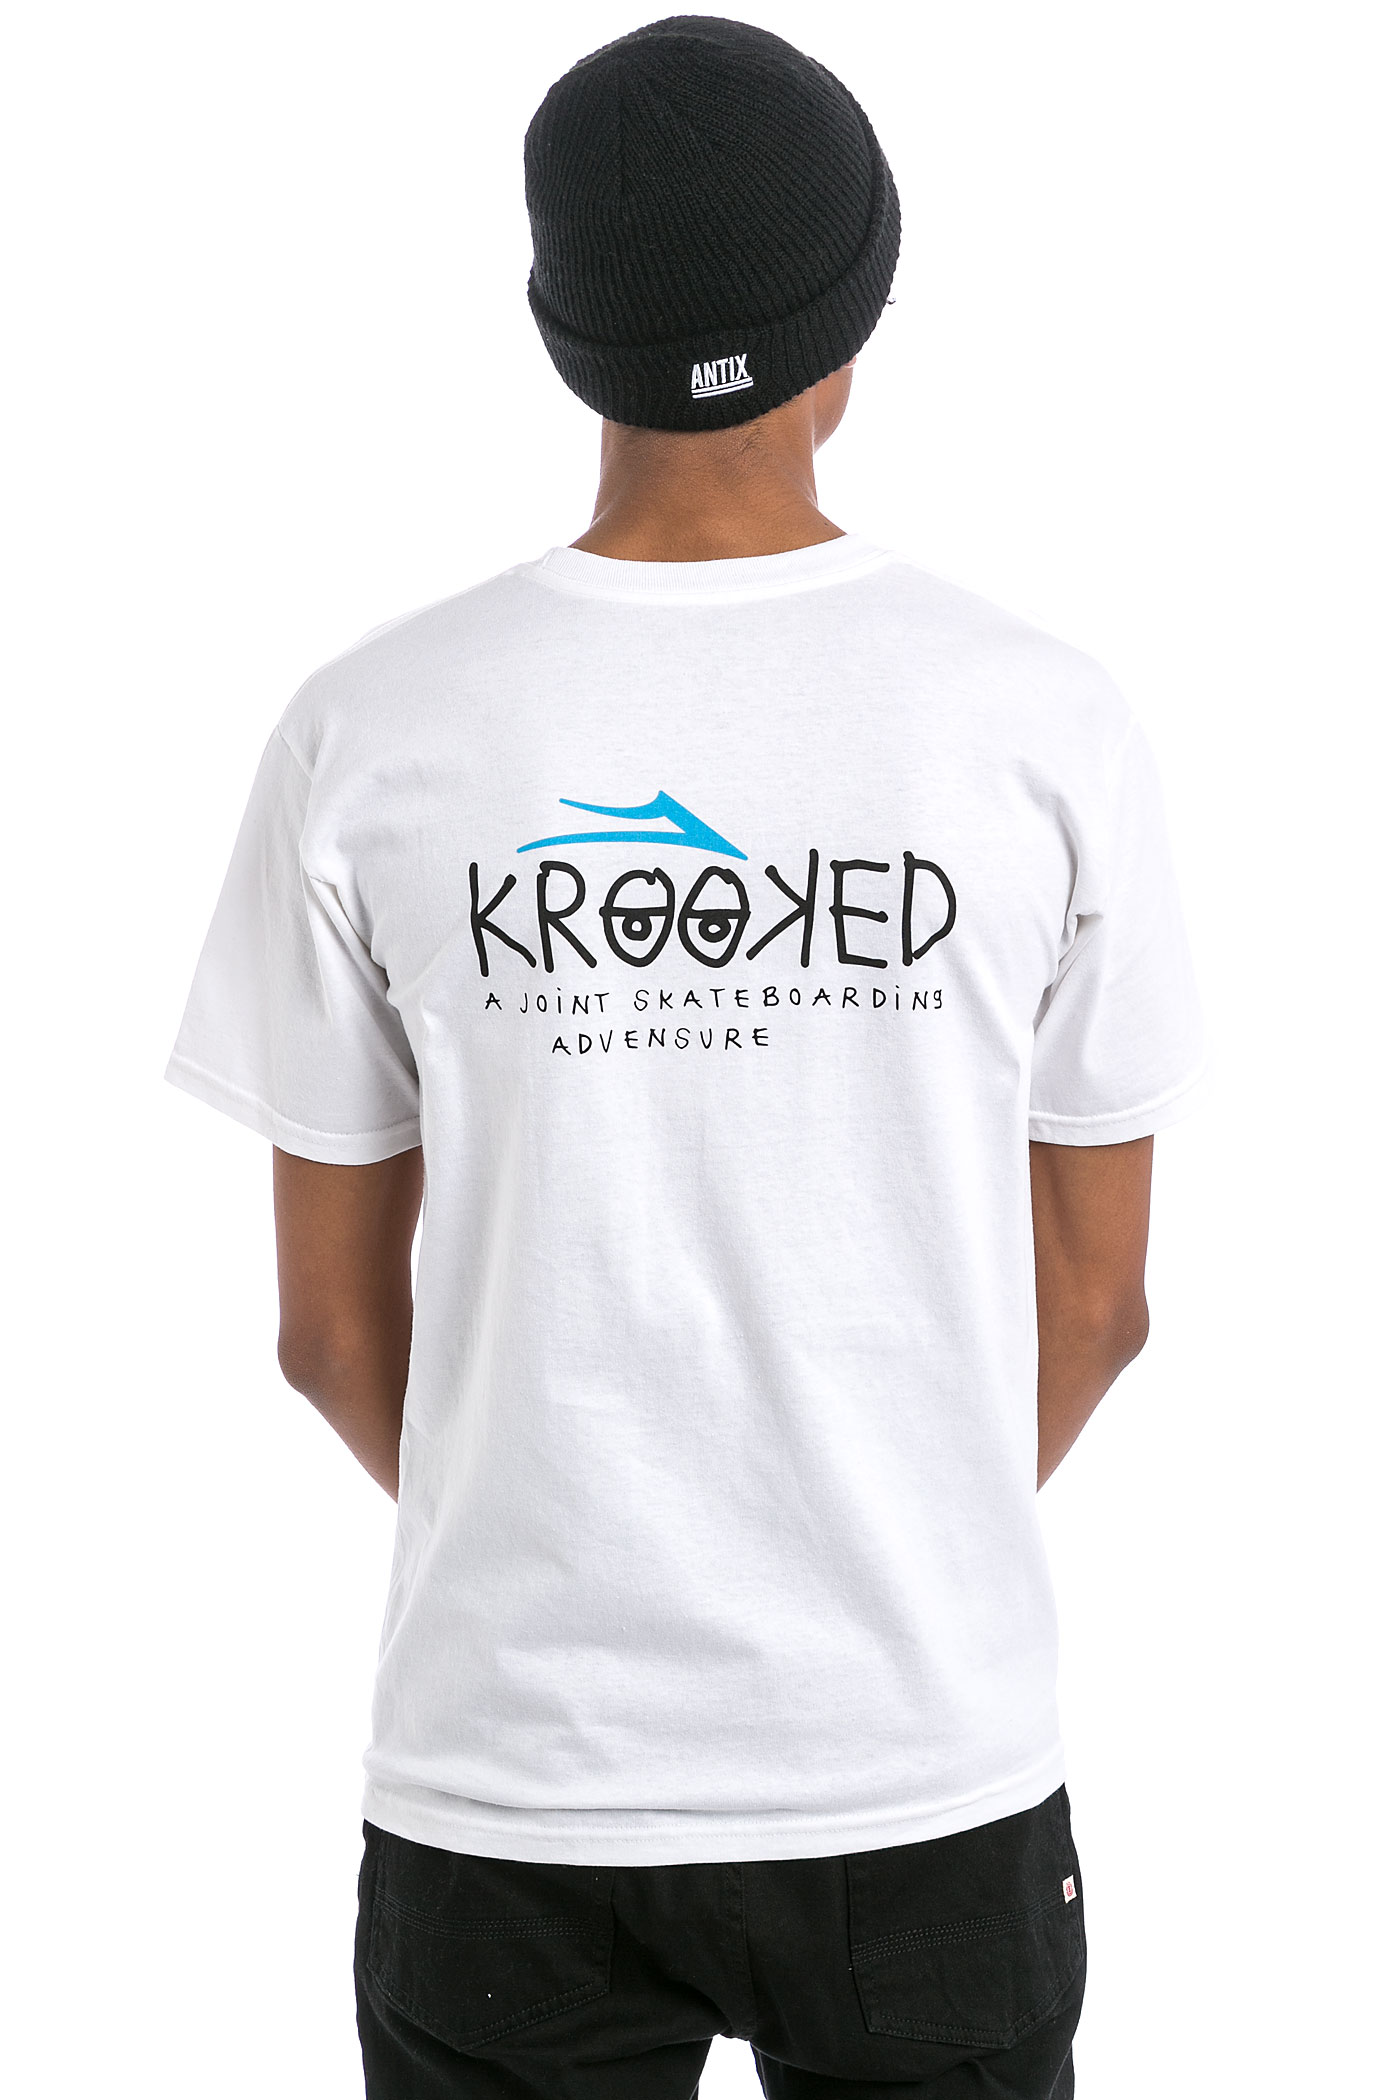 lakai x krooked t shirt white kaufen bei skatedeluxe. Black Bedroom Furniture Sets. Home Design Ideas